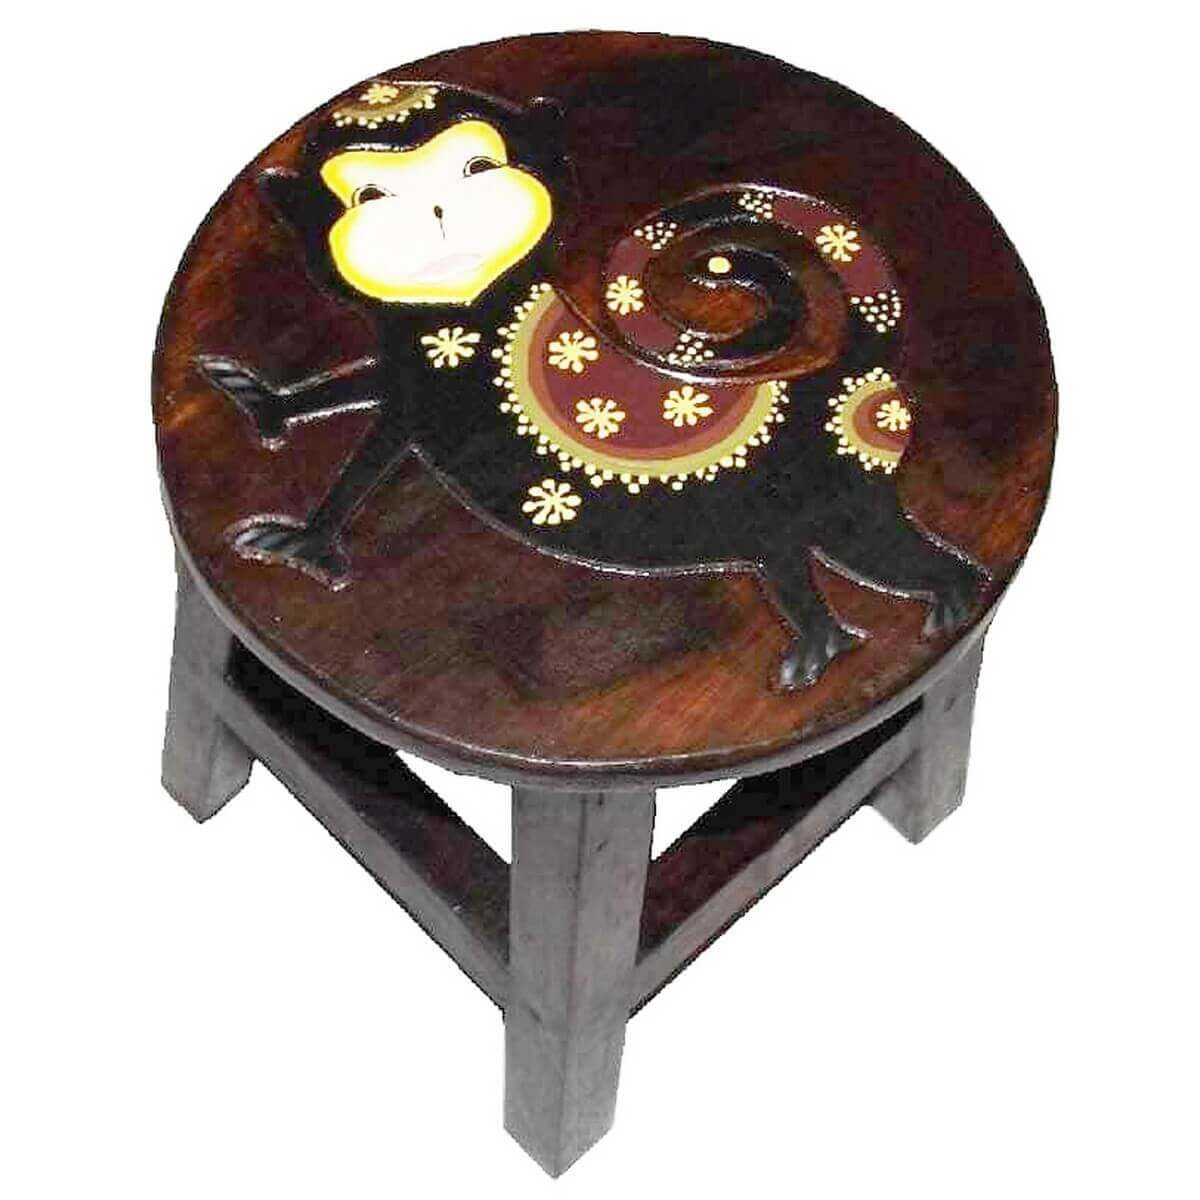 holzhocker kinderhocker hocker sitzhocker fu bank. Black Bedroom Furniture Sets. Home Design Ideas